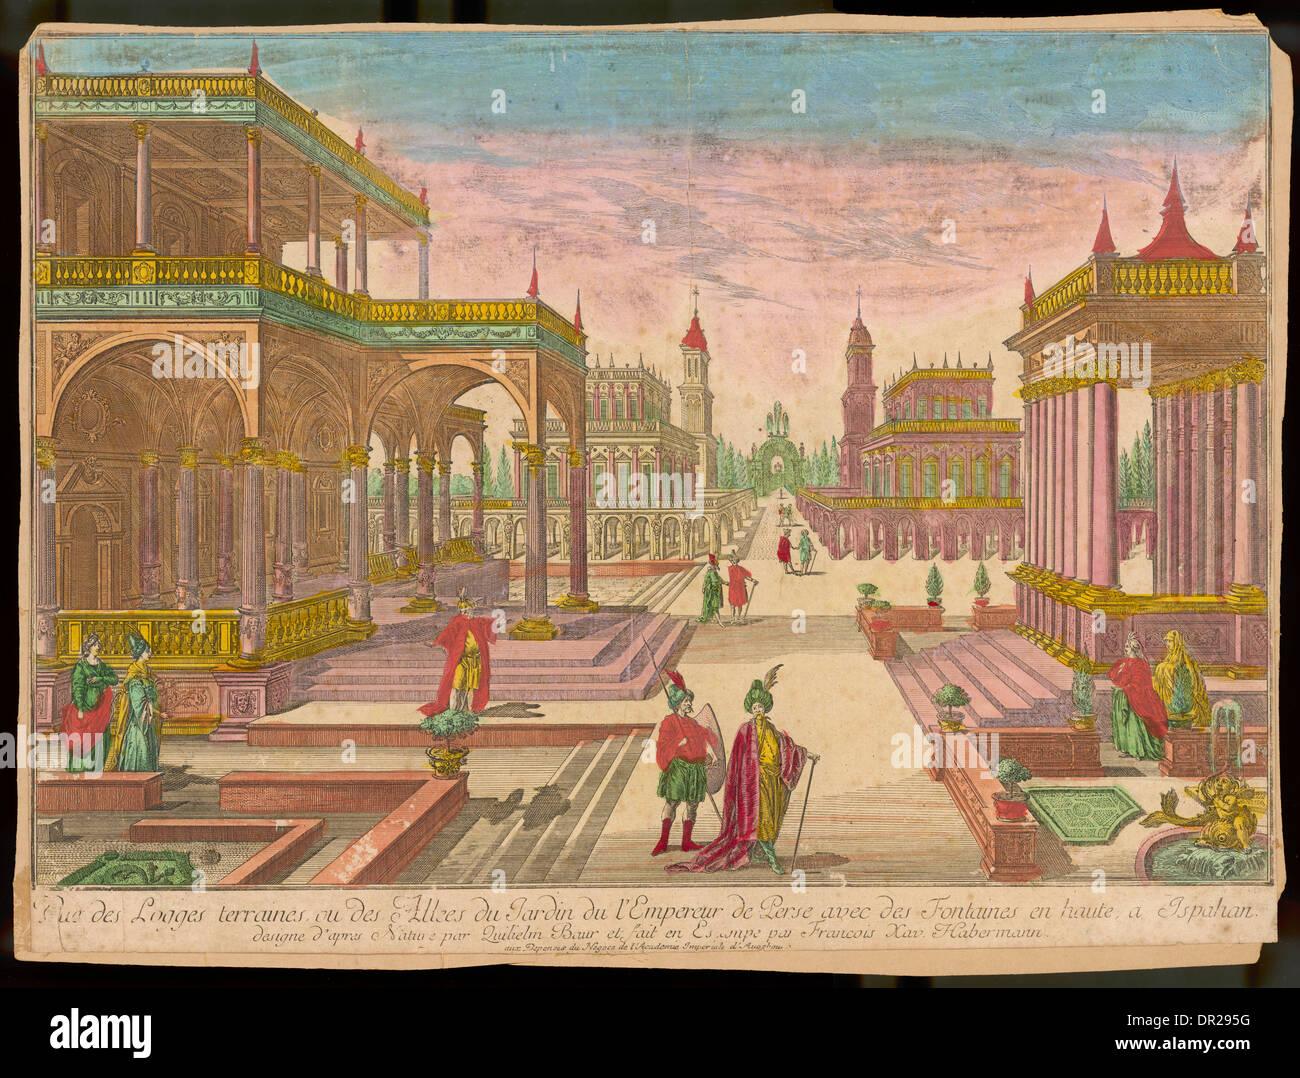 ESFAHAN, XVIII secolo Immagini Stock